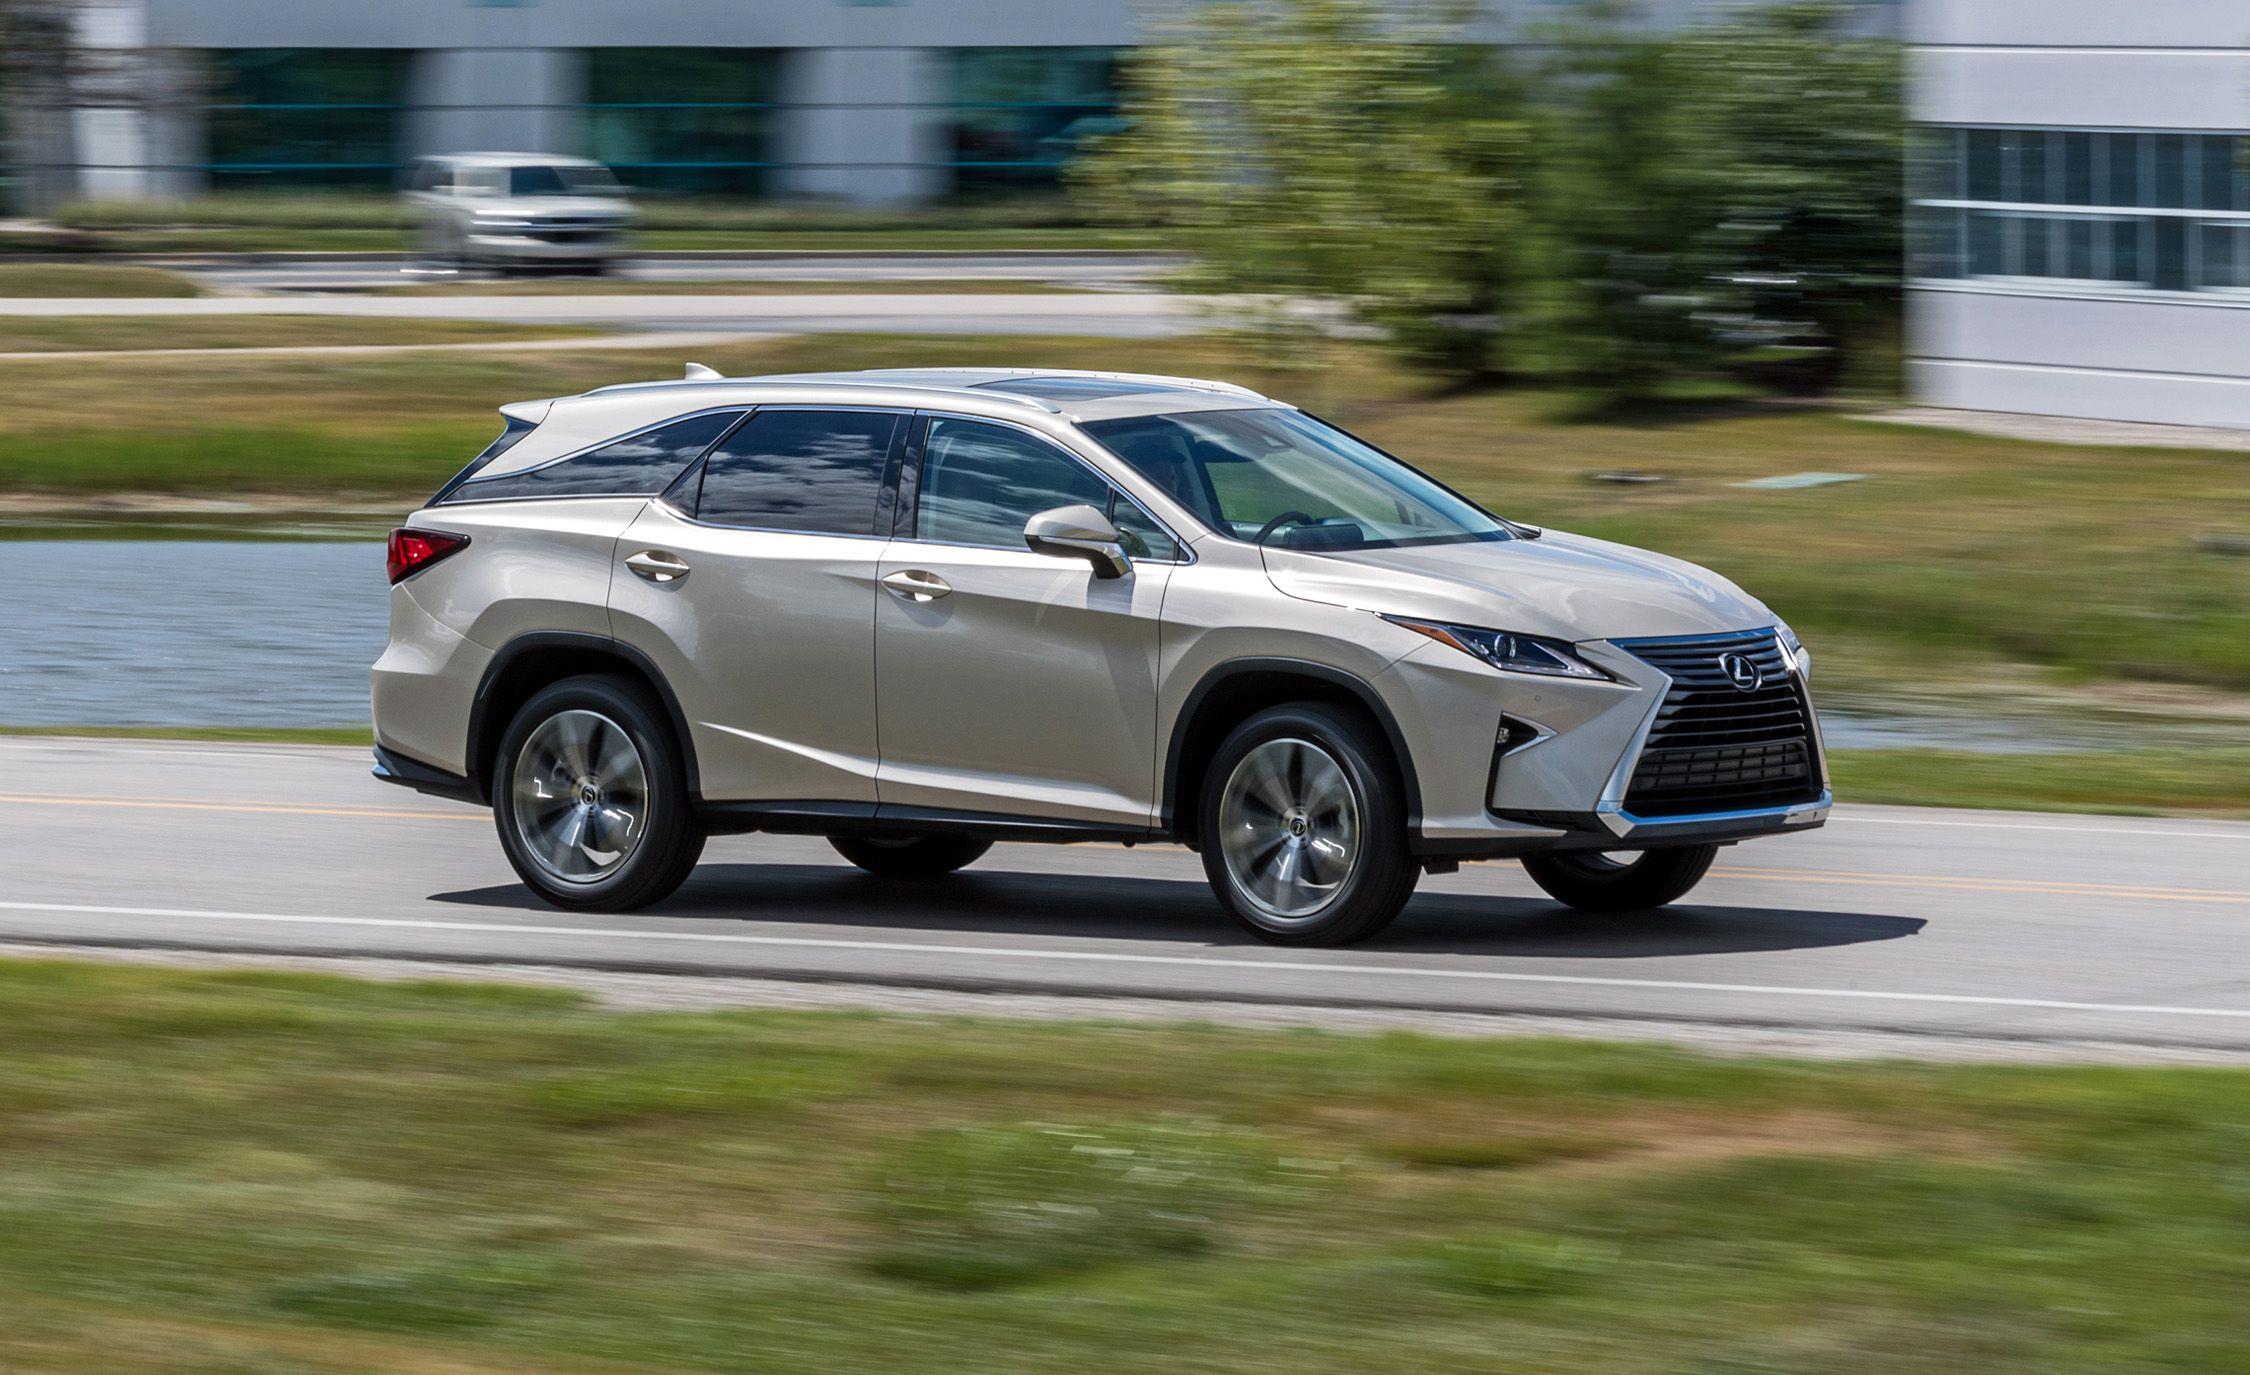 2019 Lexus Rx Reviews Lexus Rx Price Photos And Specs Car And